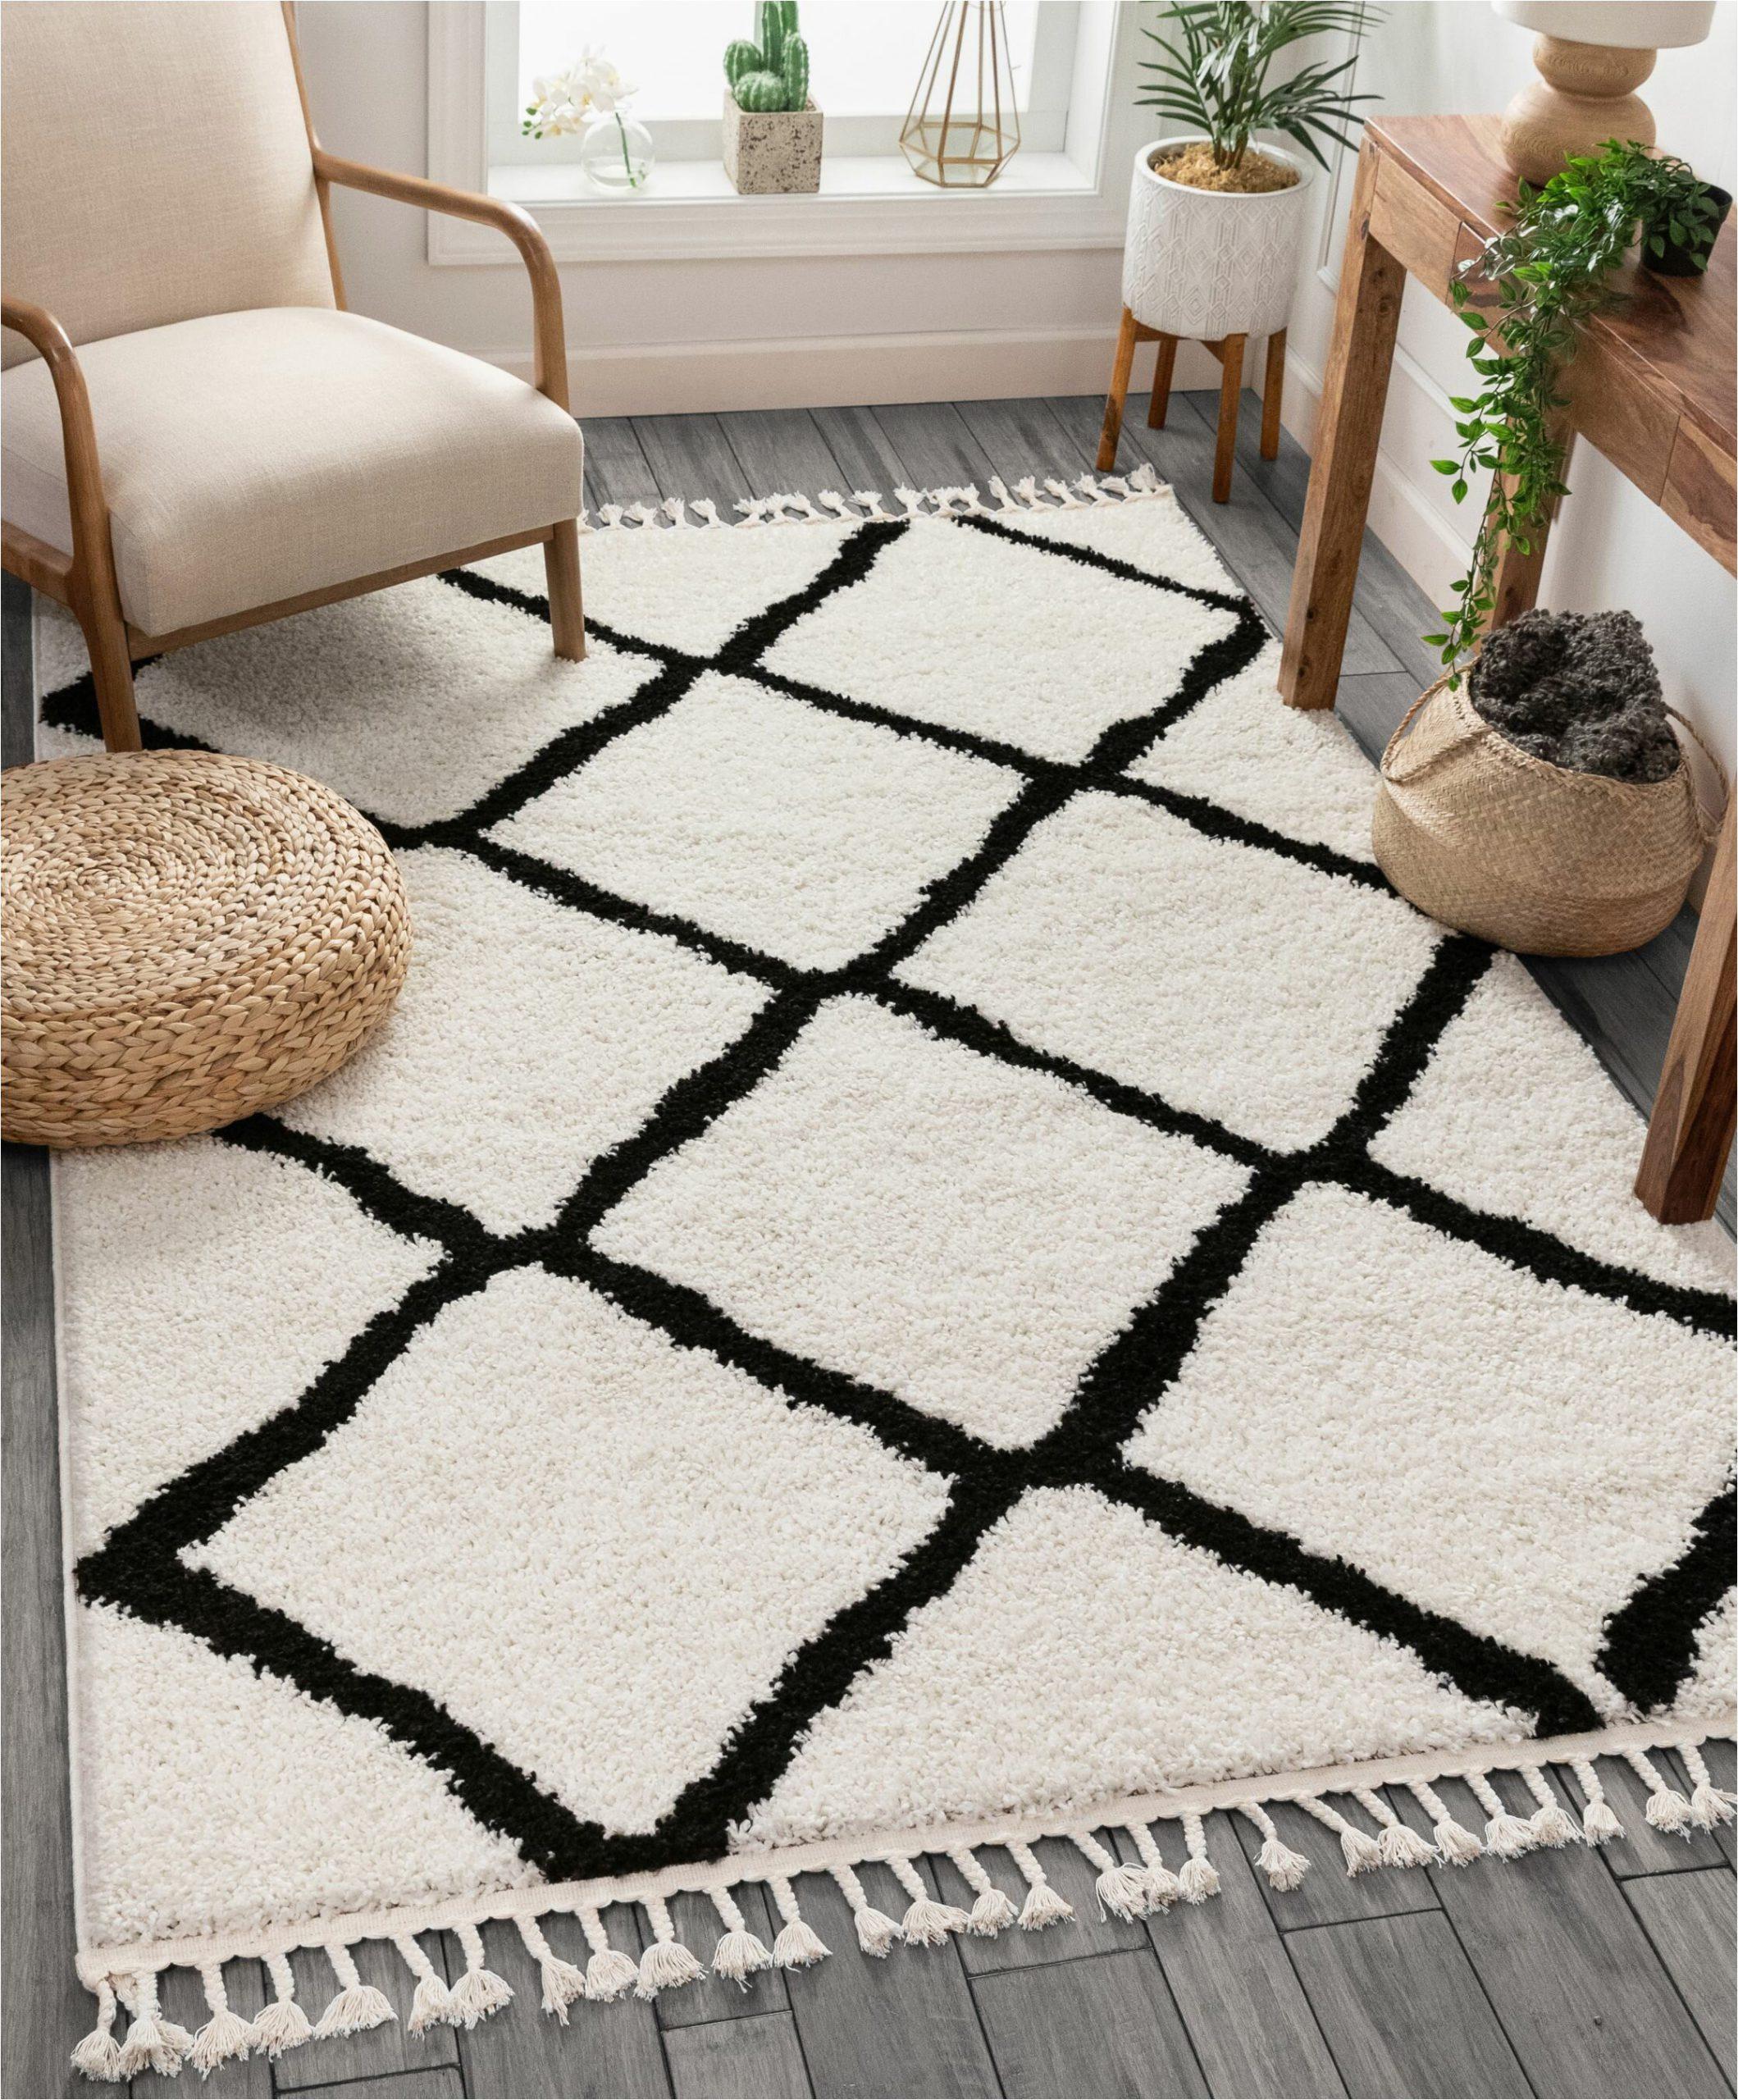 cabana geometric blackwhite area rug